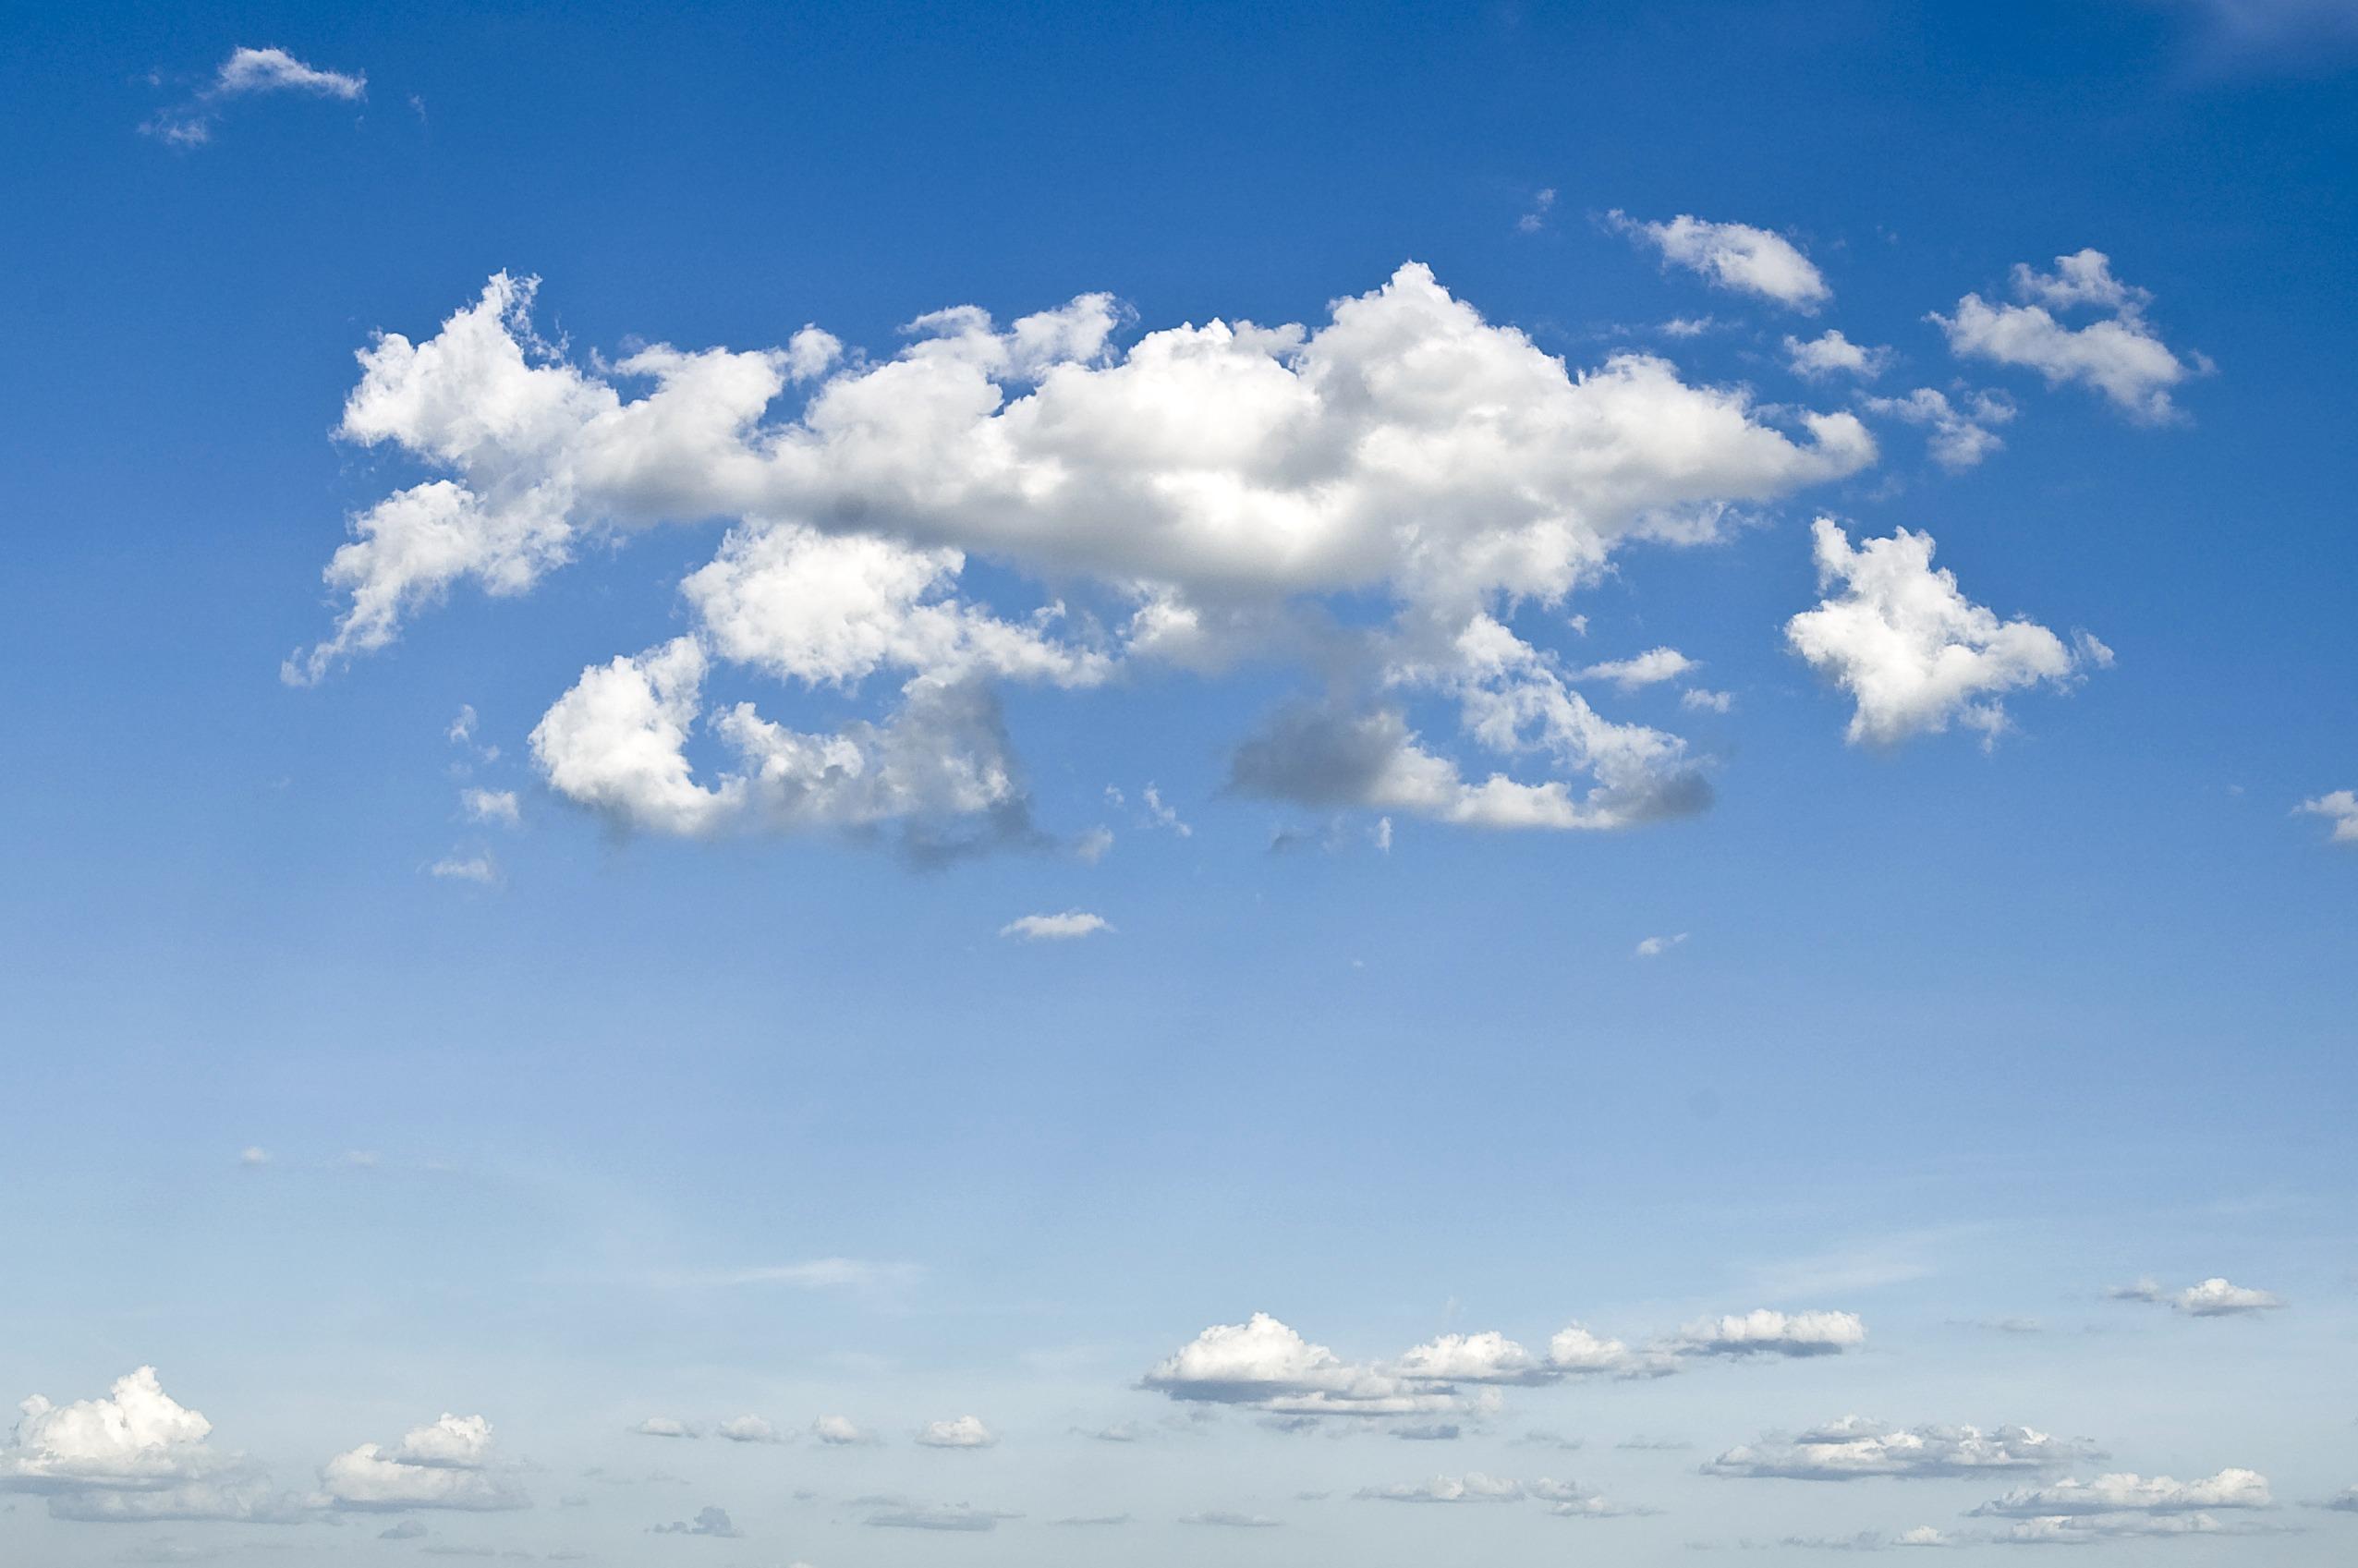 Black Galaxy Wallpaper Hd Blue Cloudy Sky 183 Free Stock Photo